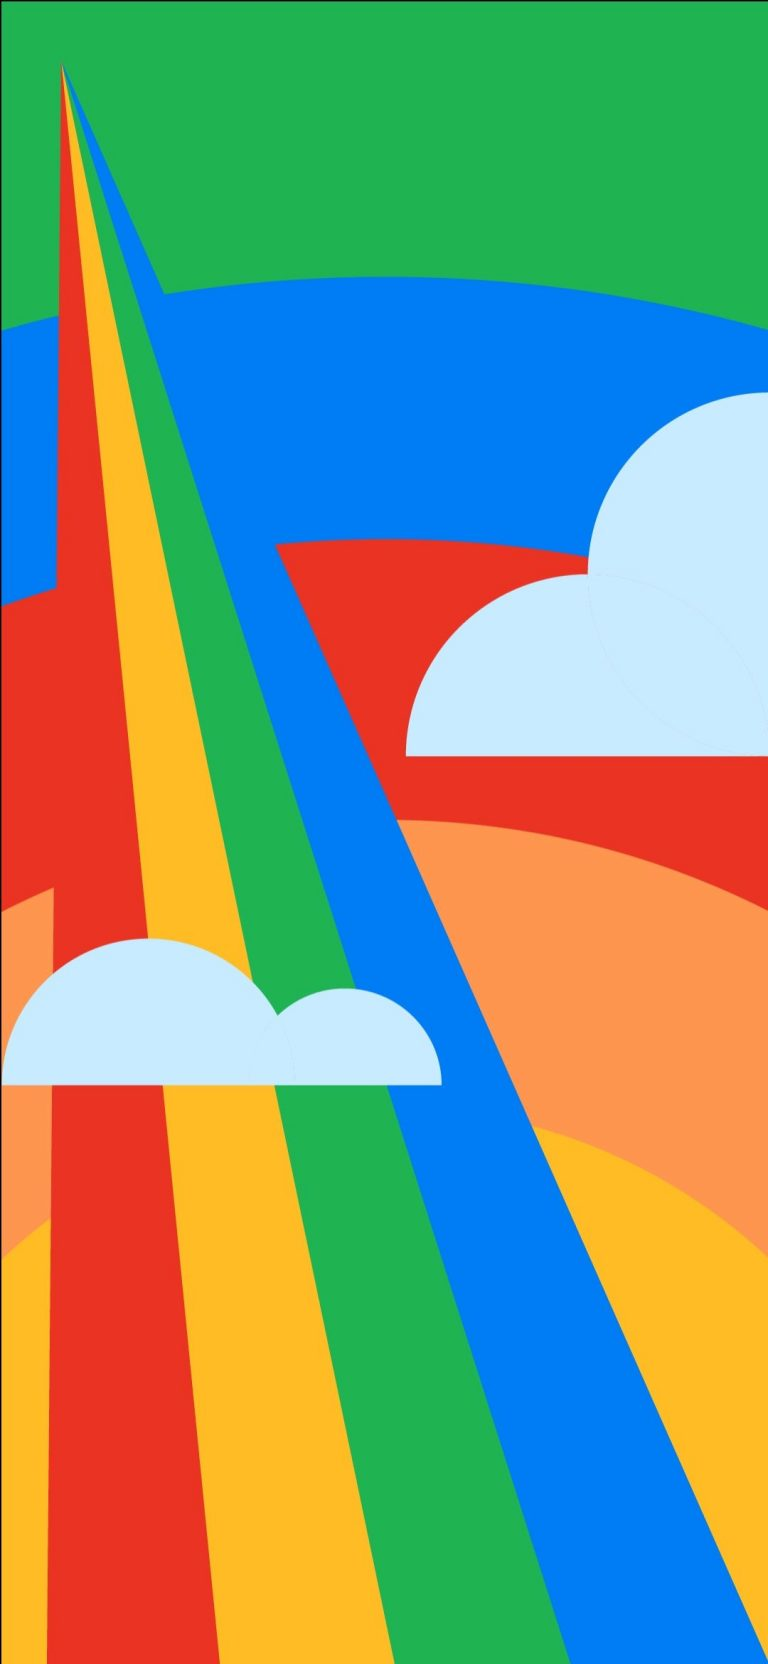 Google Pixel 4a Stock Wallpaper [1080x2340] - 06